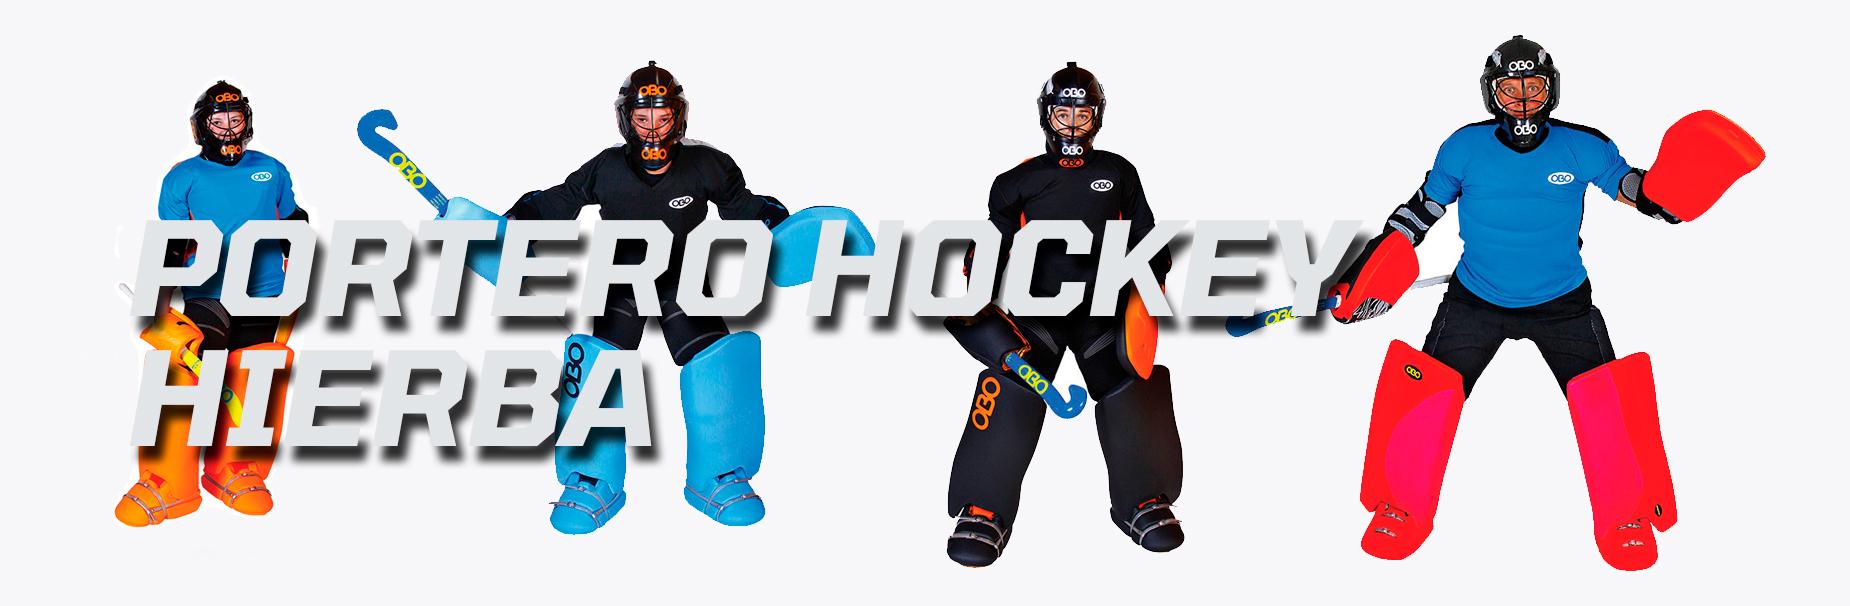 Portero Hockey Hierba